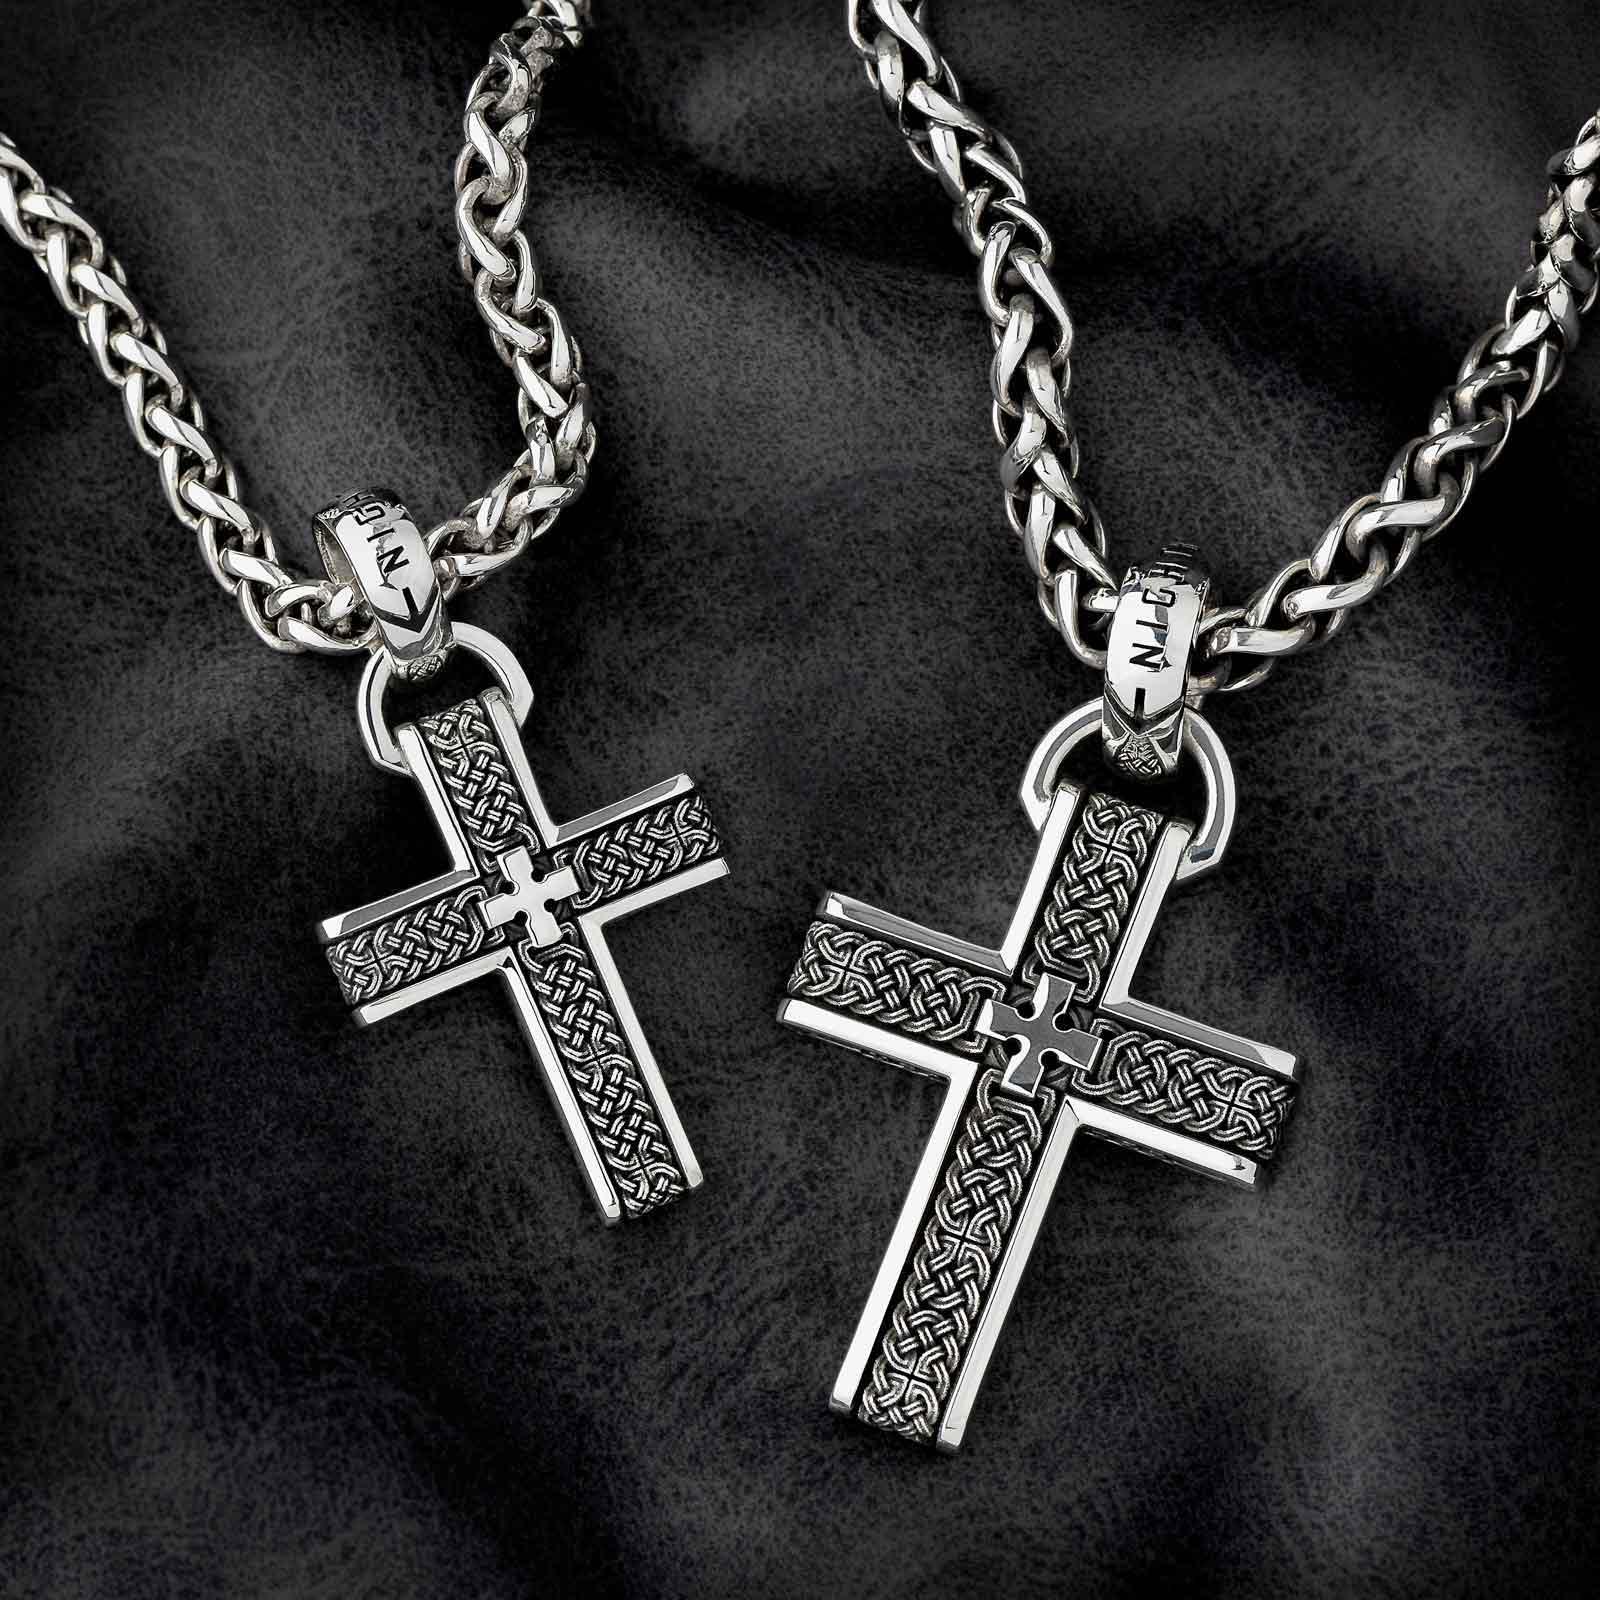 The Joshua Cross Pendant in both Small and Medium Sizes